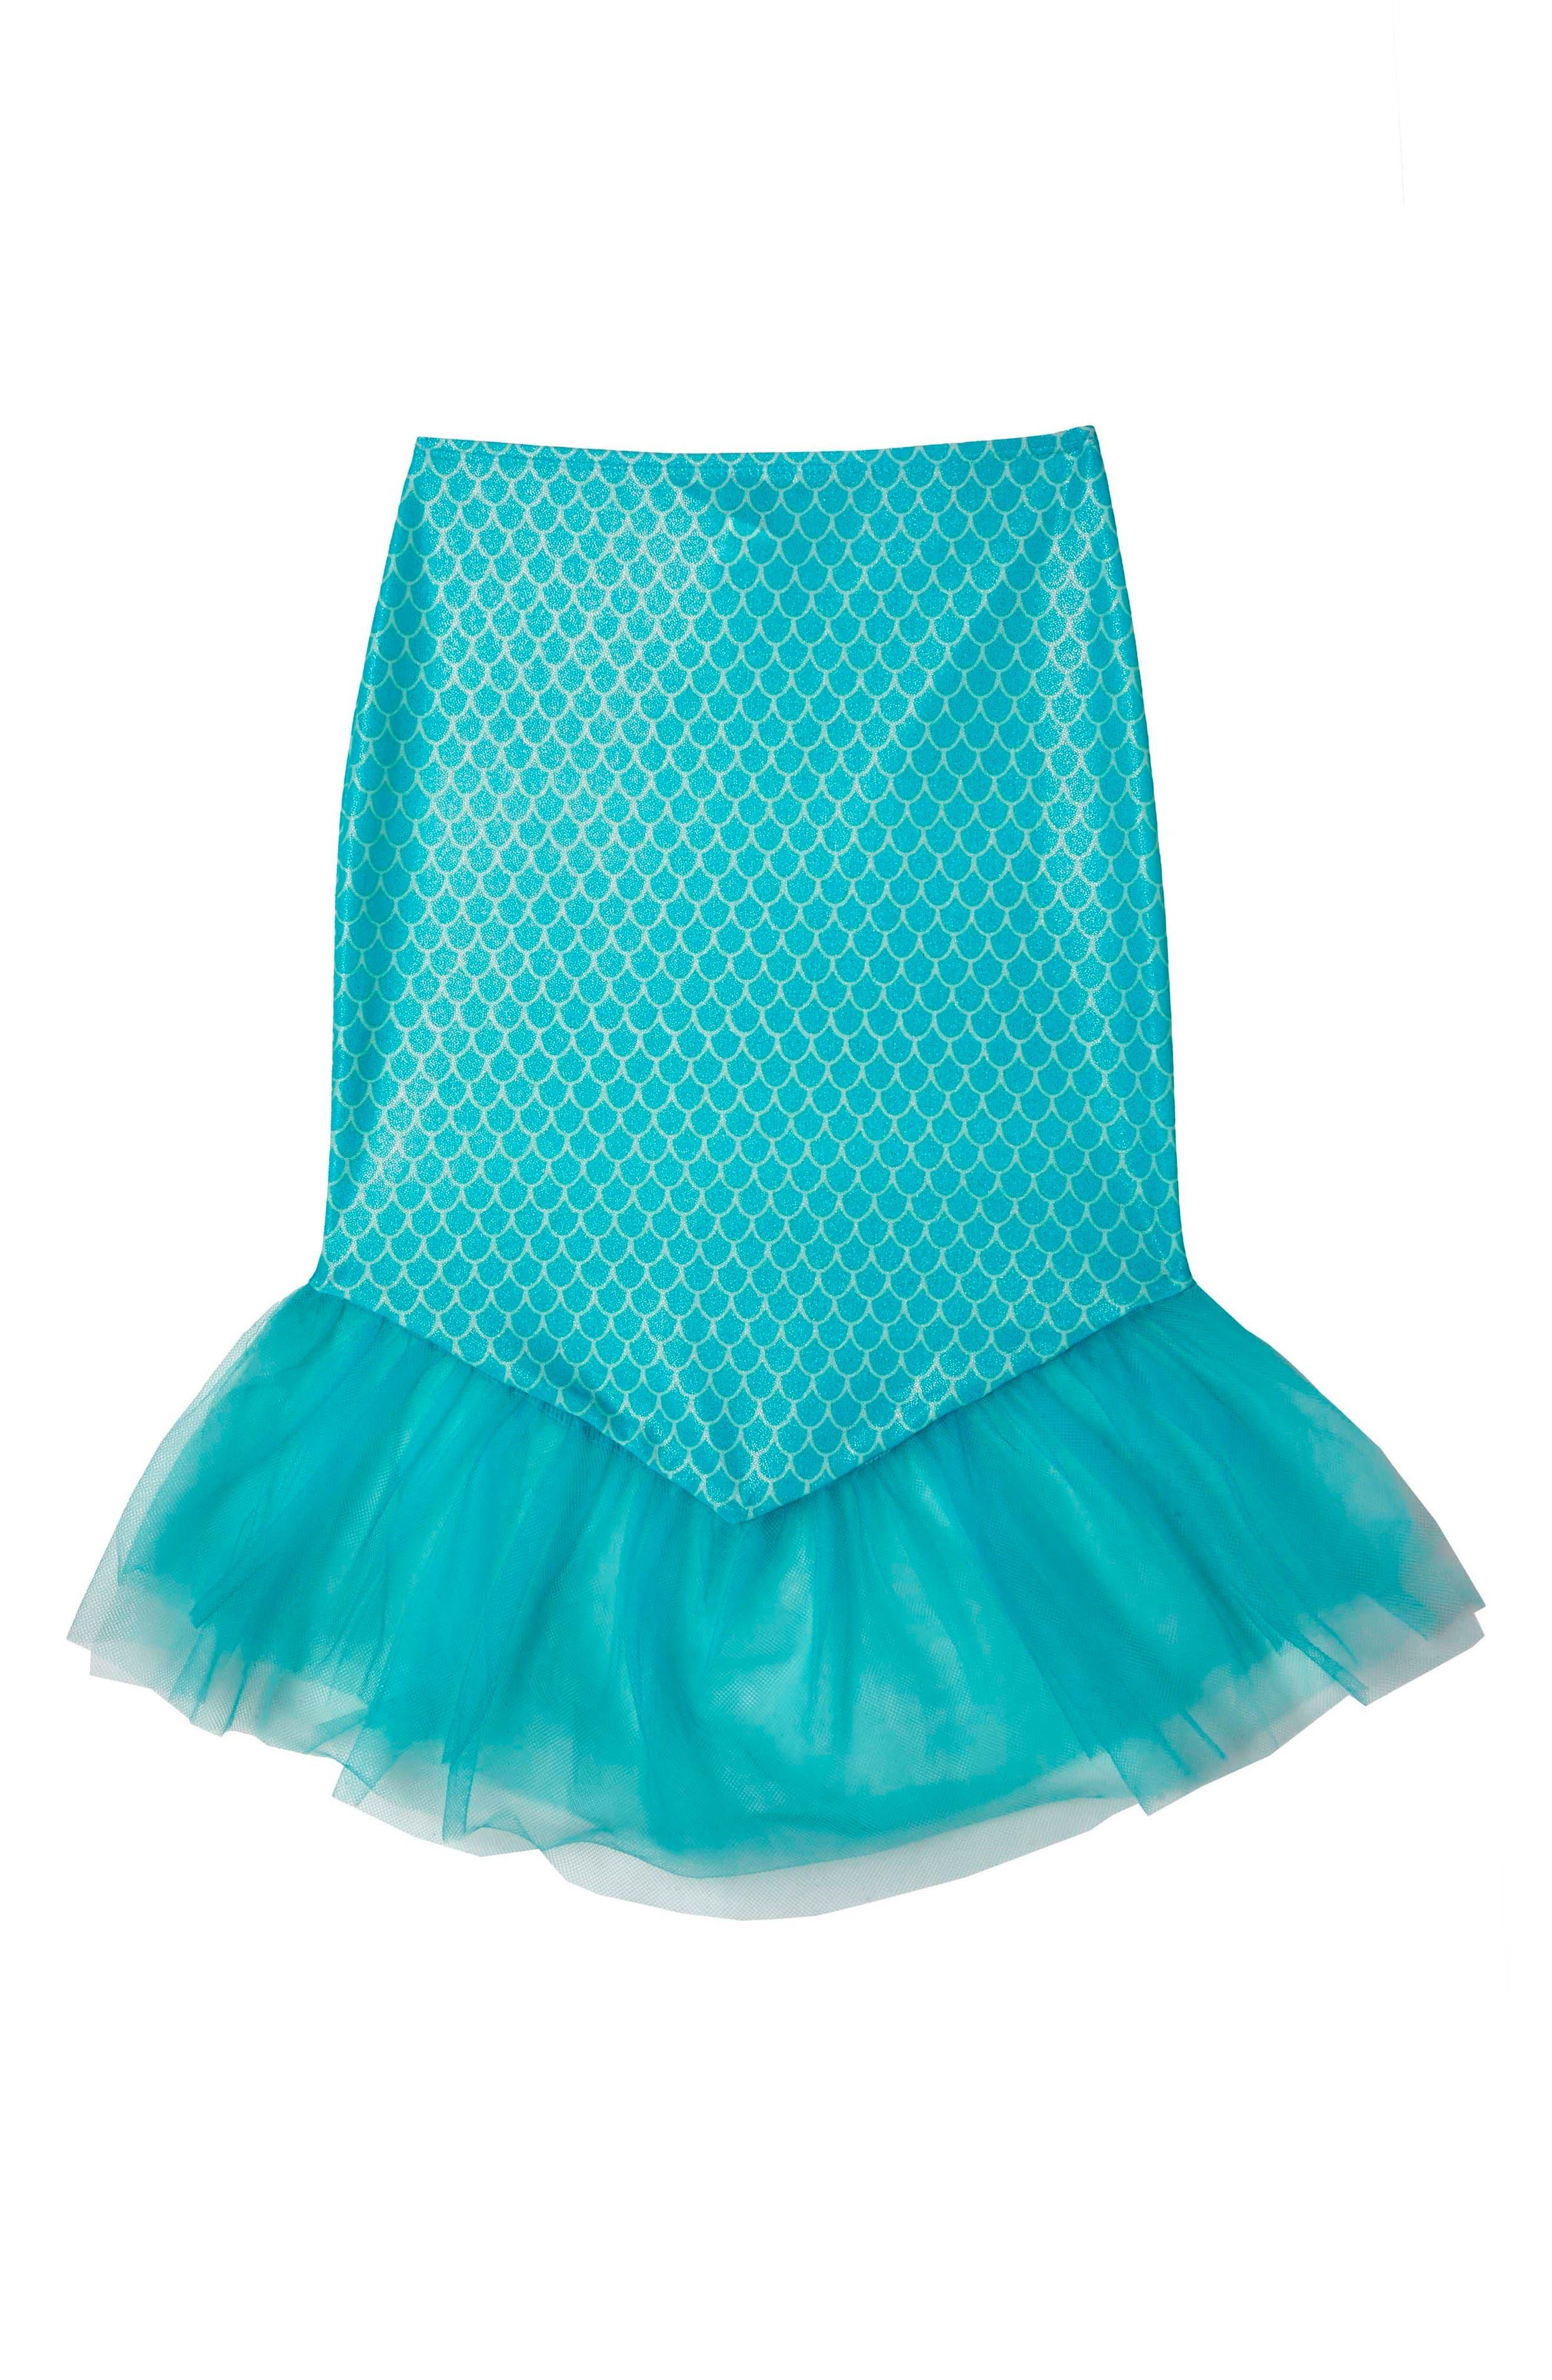 Mermaid Princess Cover-Up Skirt,                         Main,                         color, Aqua